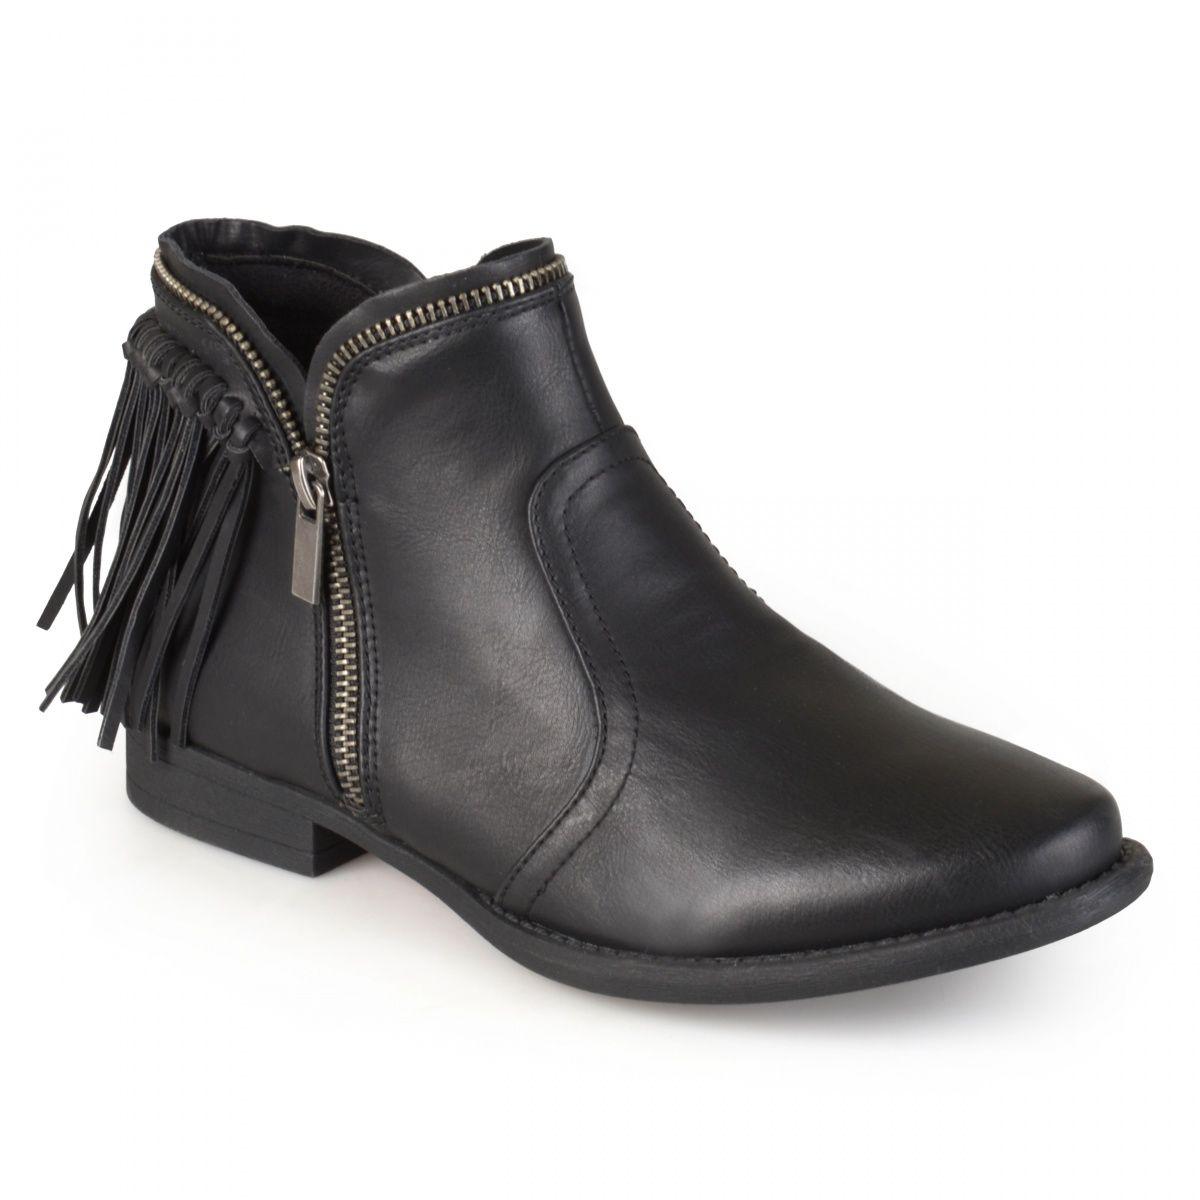 Pin on shoe love